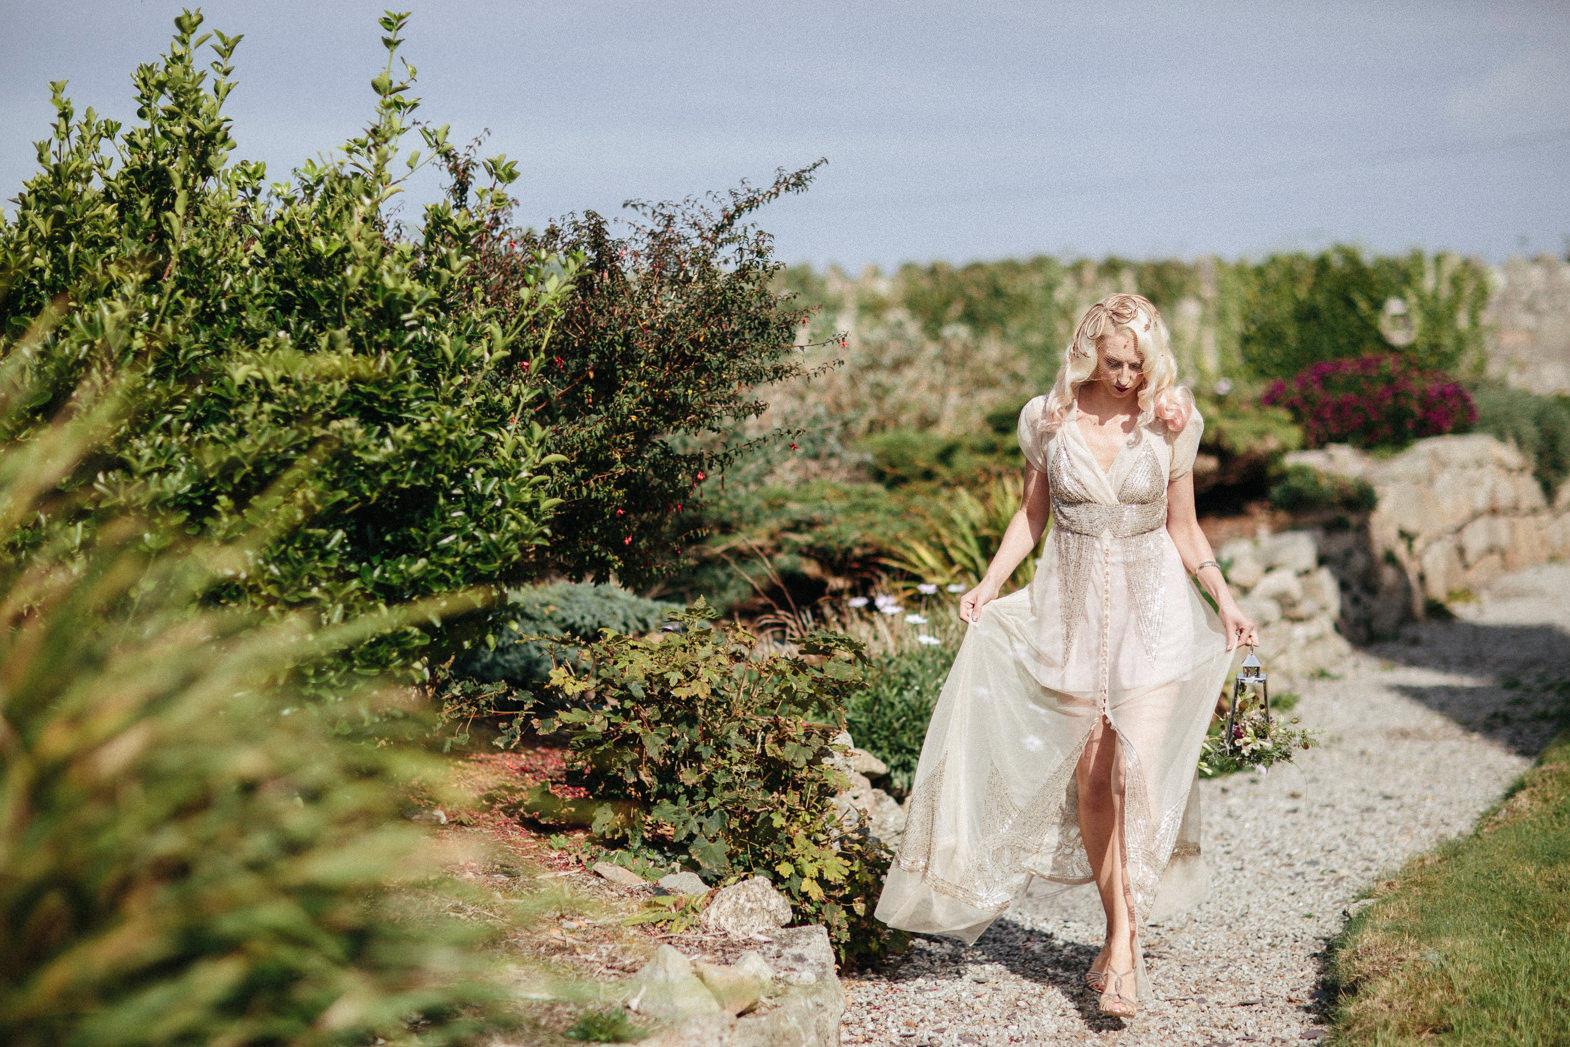 WEDDING PHOTOGRAPHY AT BOHO (24).jpg